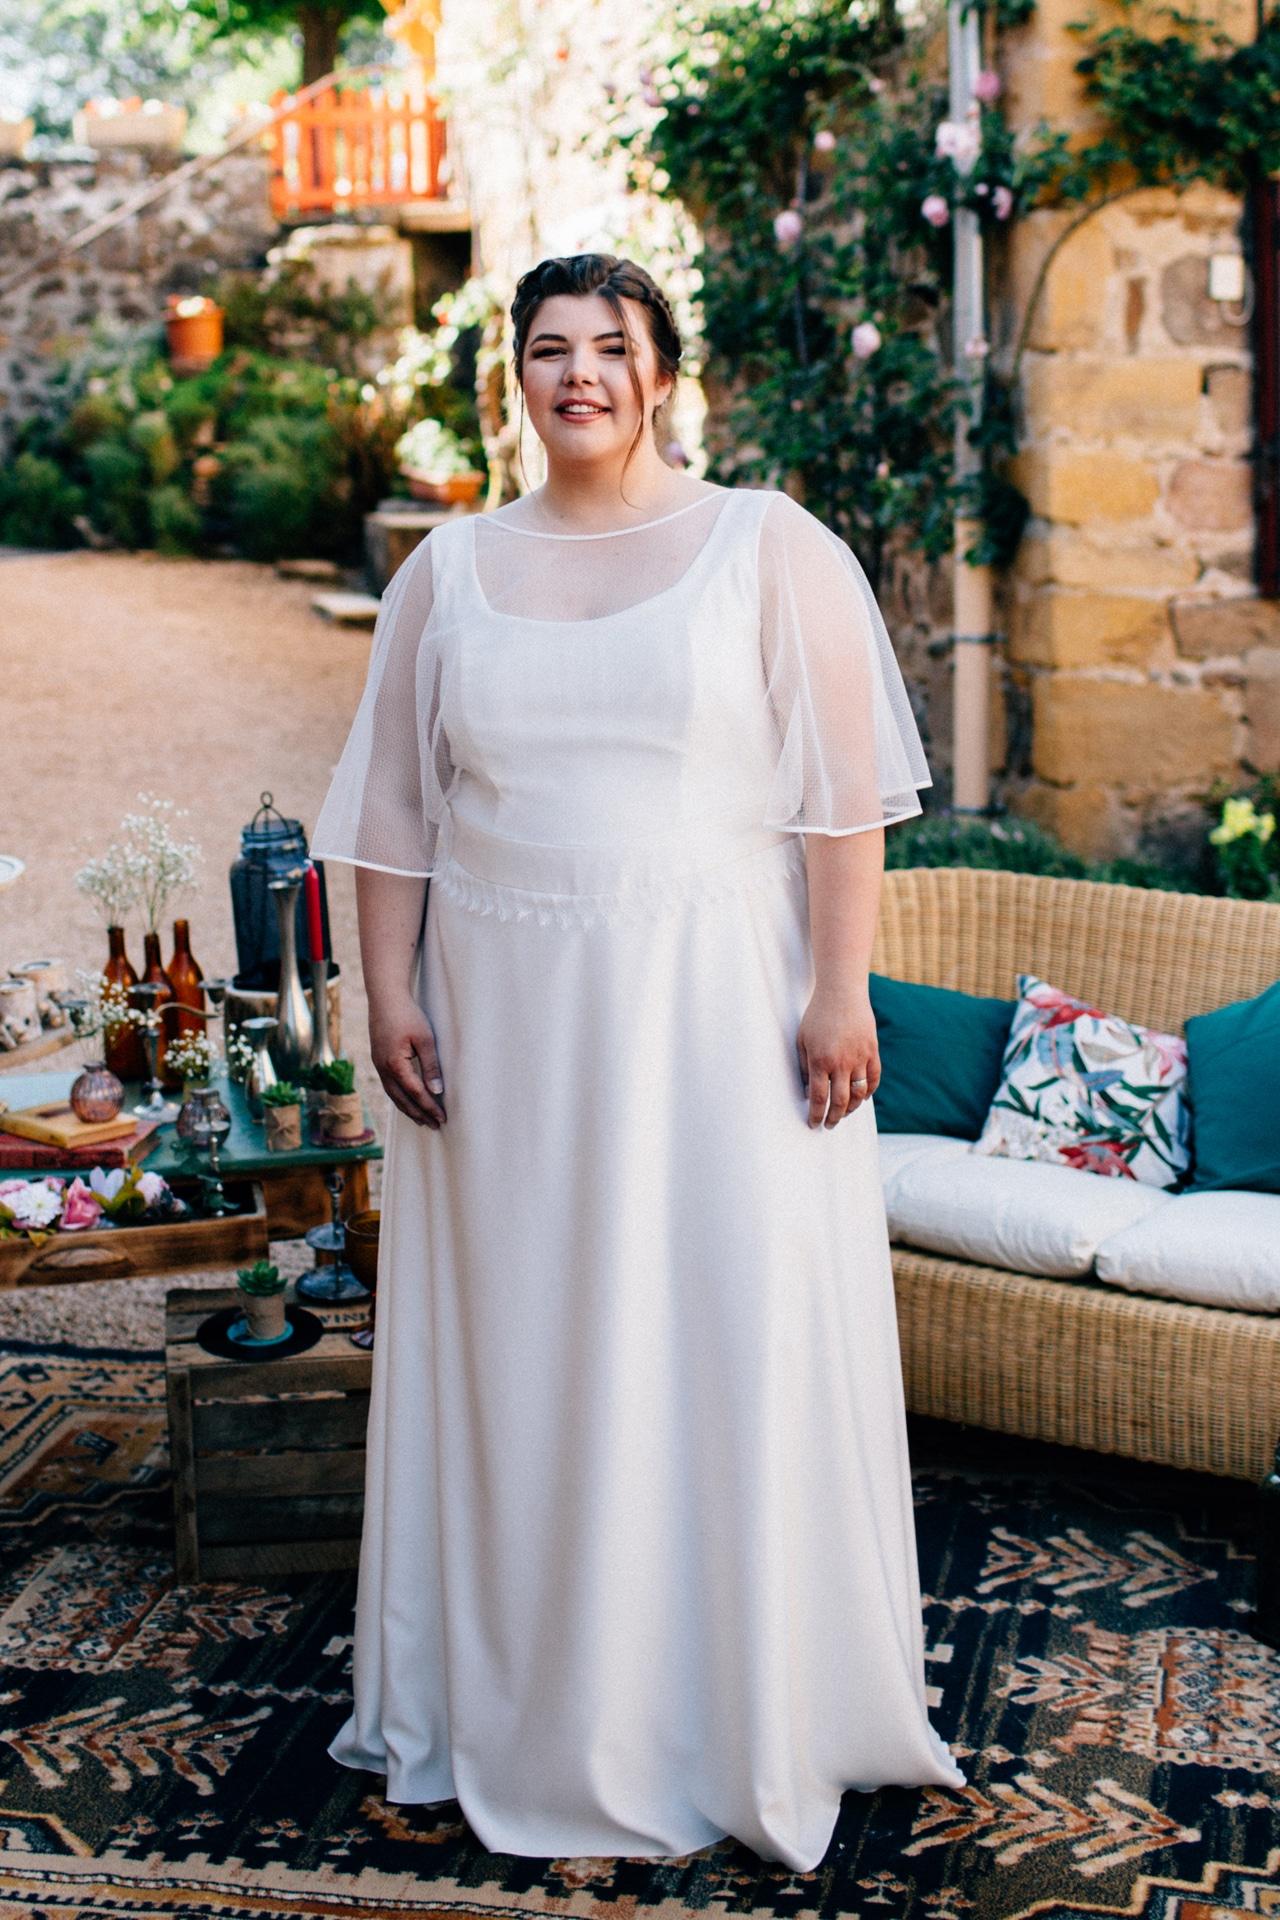 Recherche robe de mariee grande taille